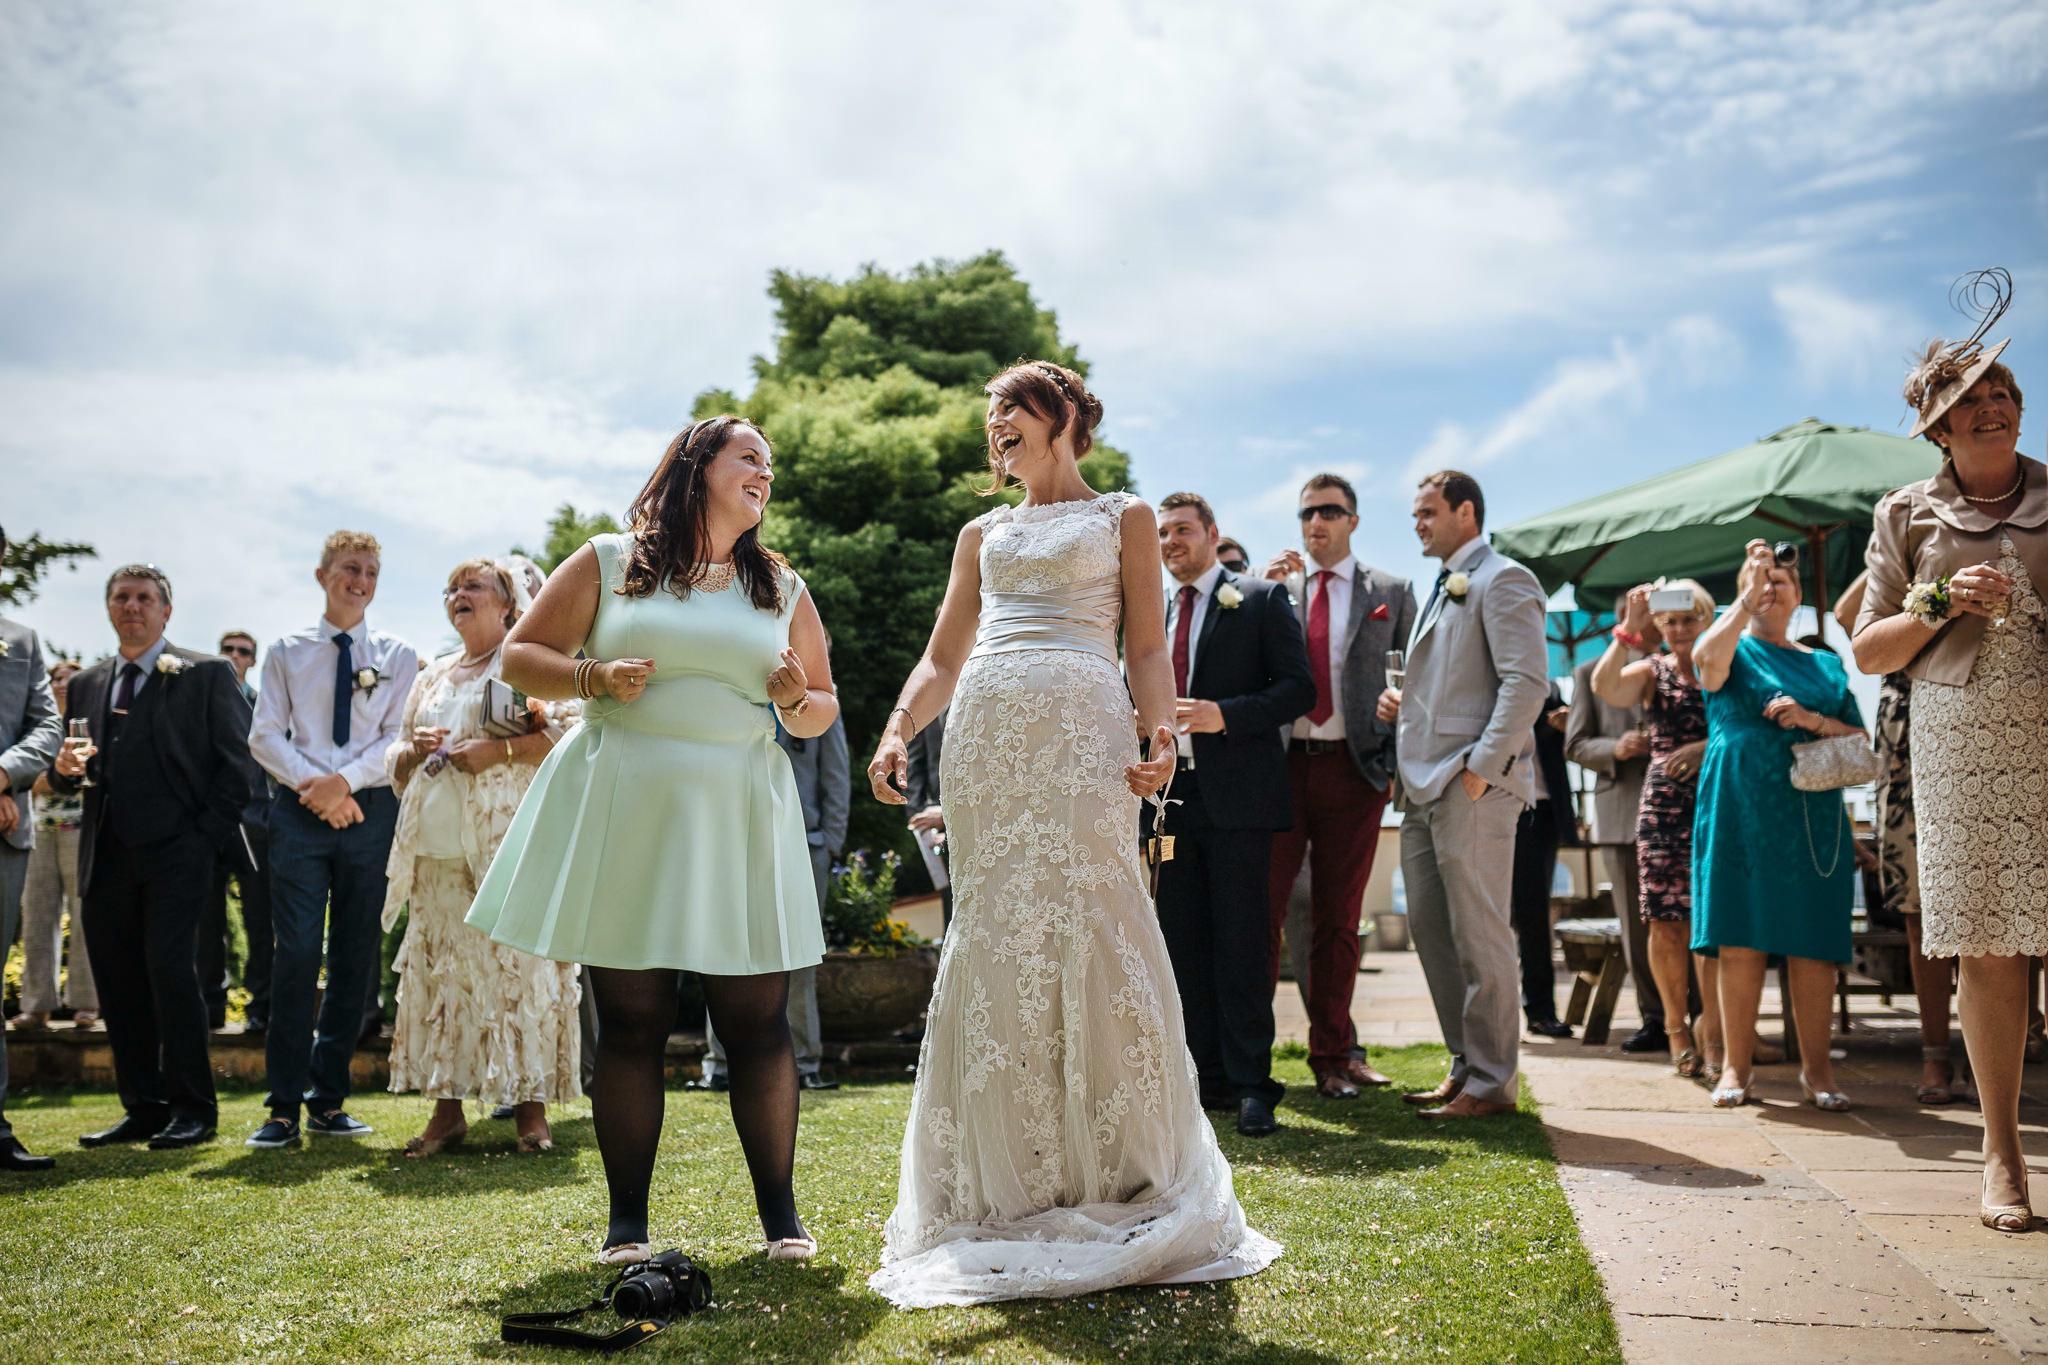 paul-marbrook-Caer-Llan-Wedding-Photographer-90057